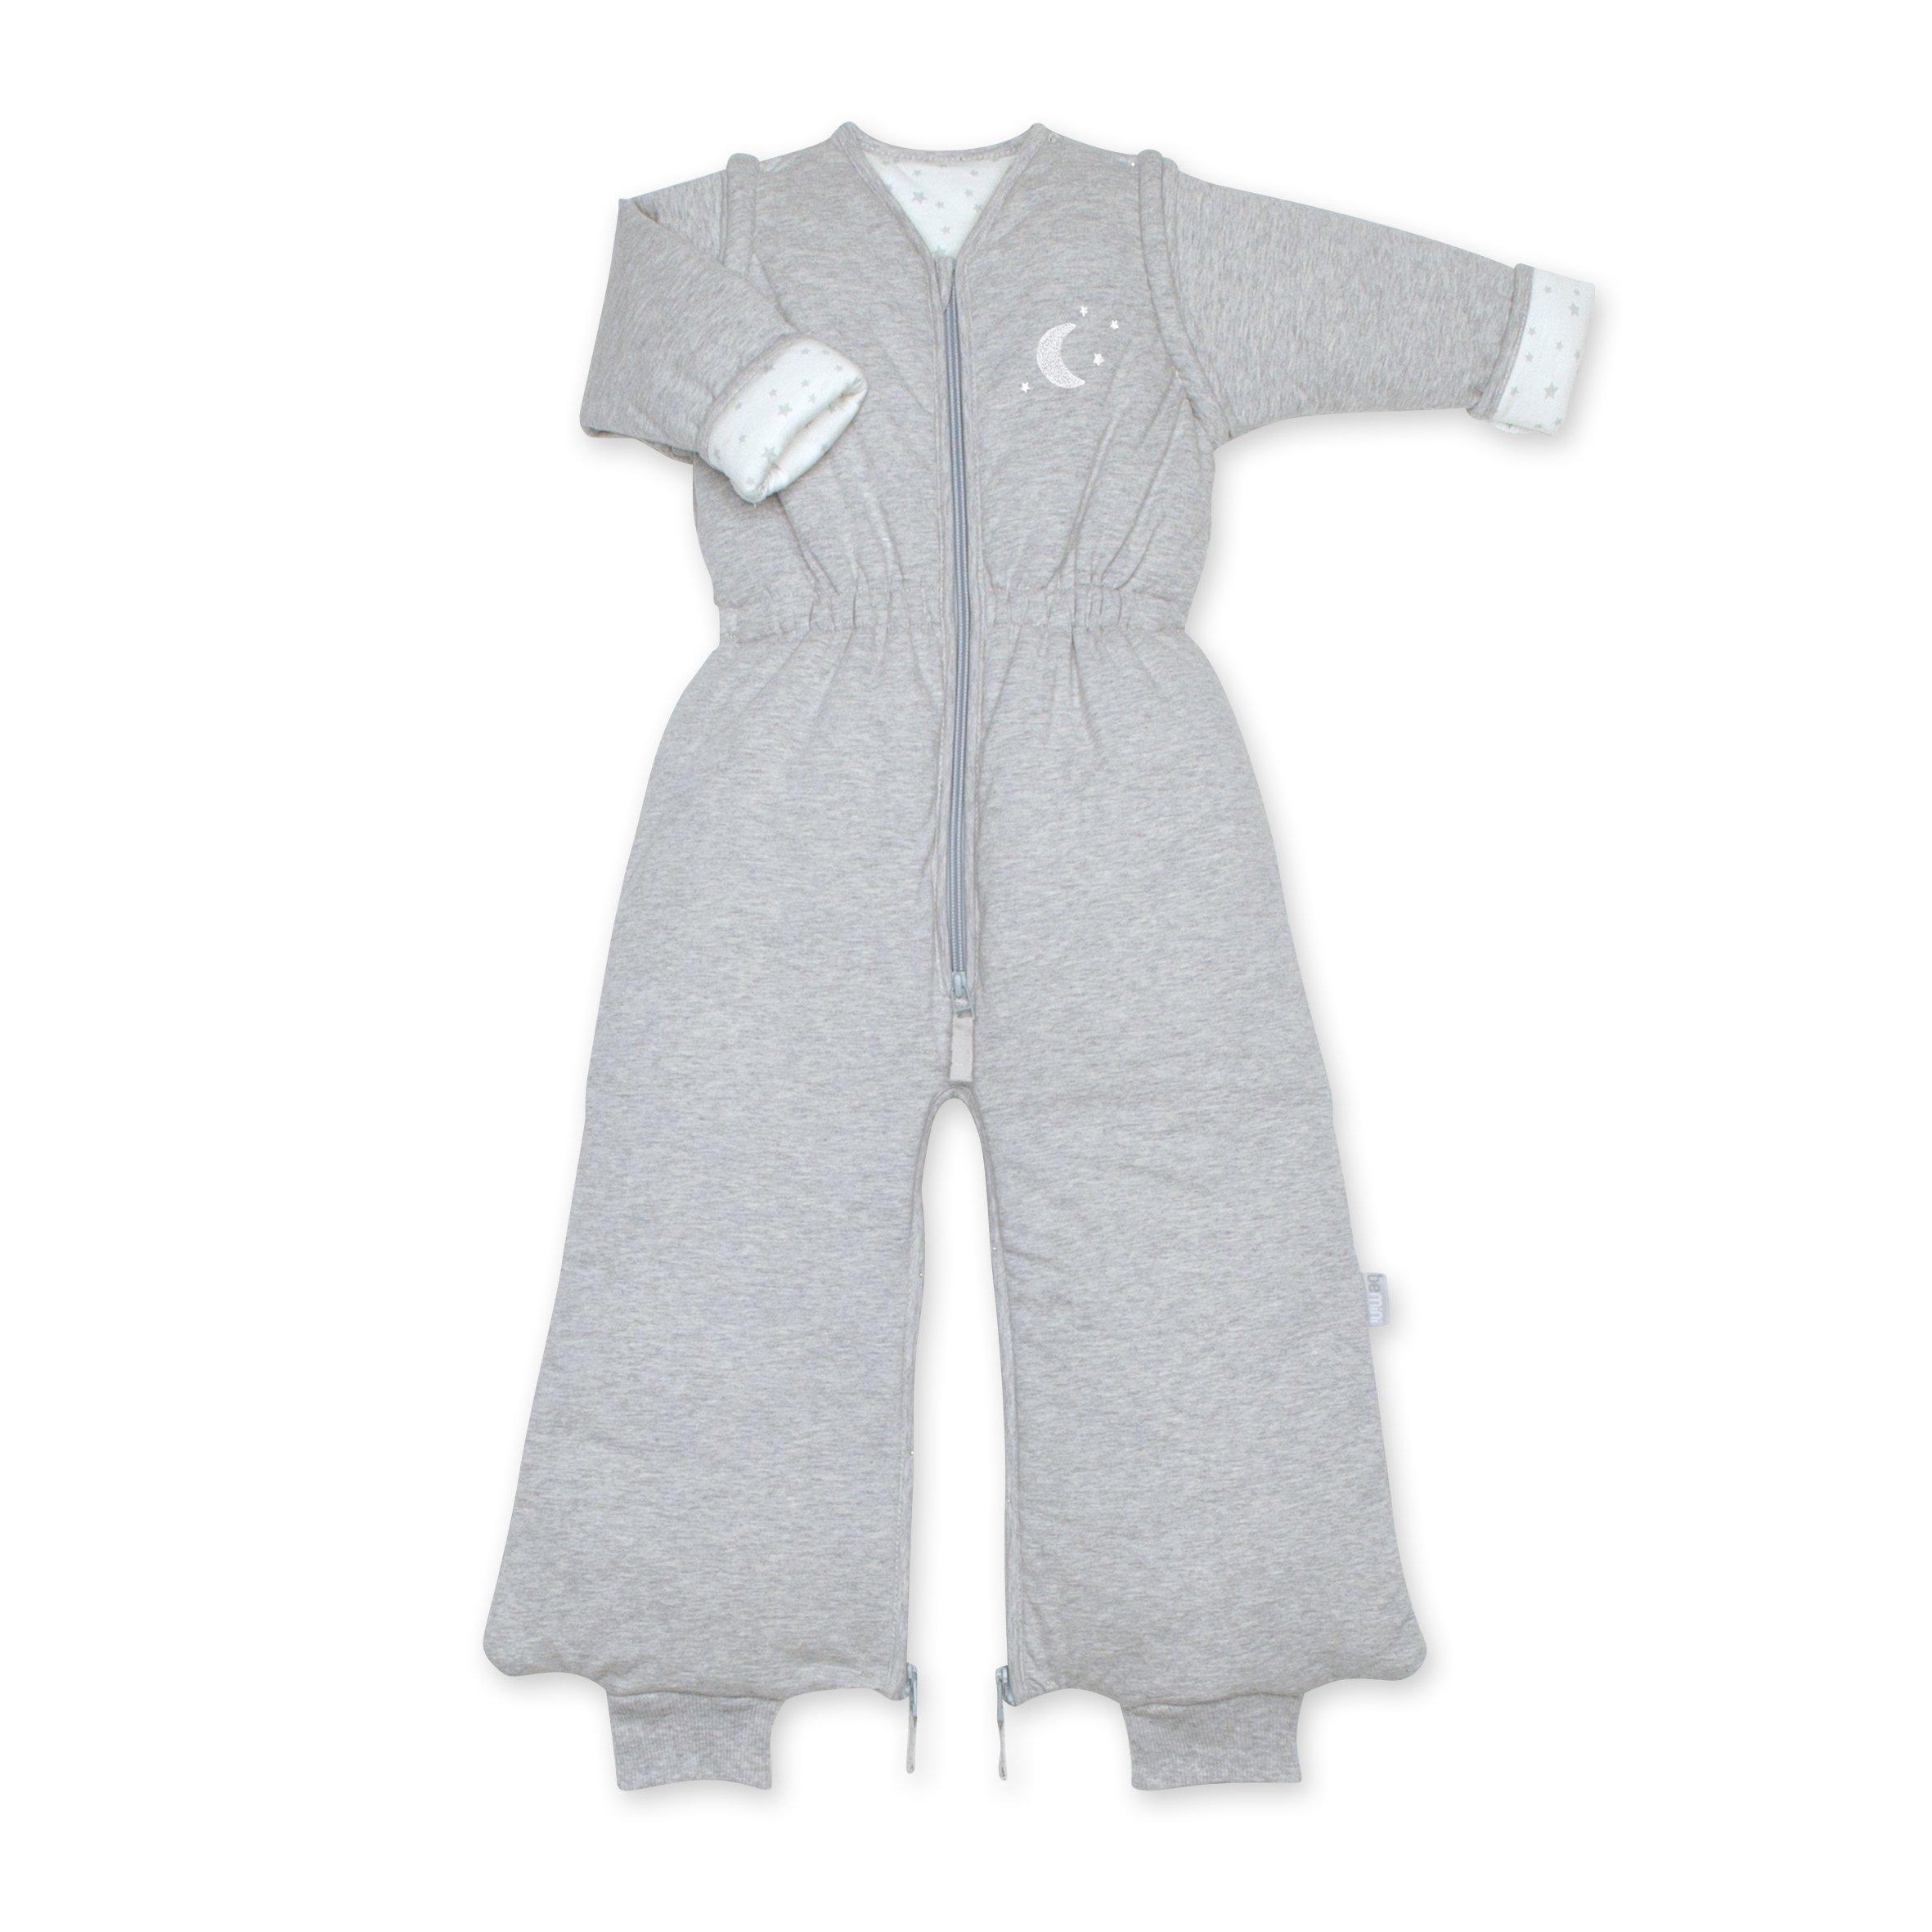 bemini by Baby Boum 161stary95jm bolsa saco de dormir de Pady Jersey Algodón 6–24meses